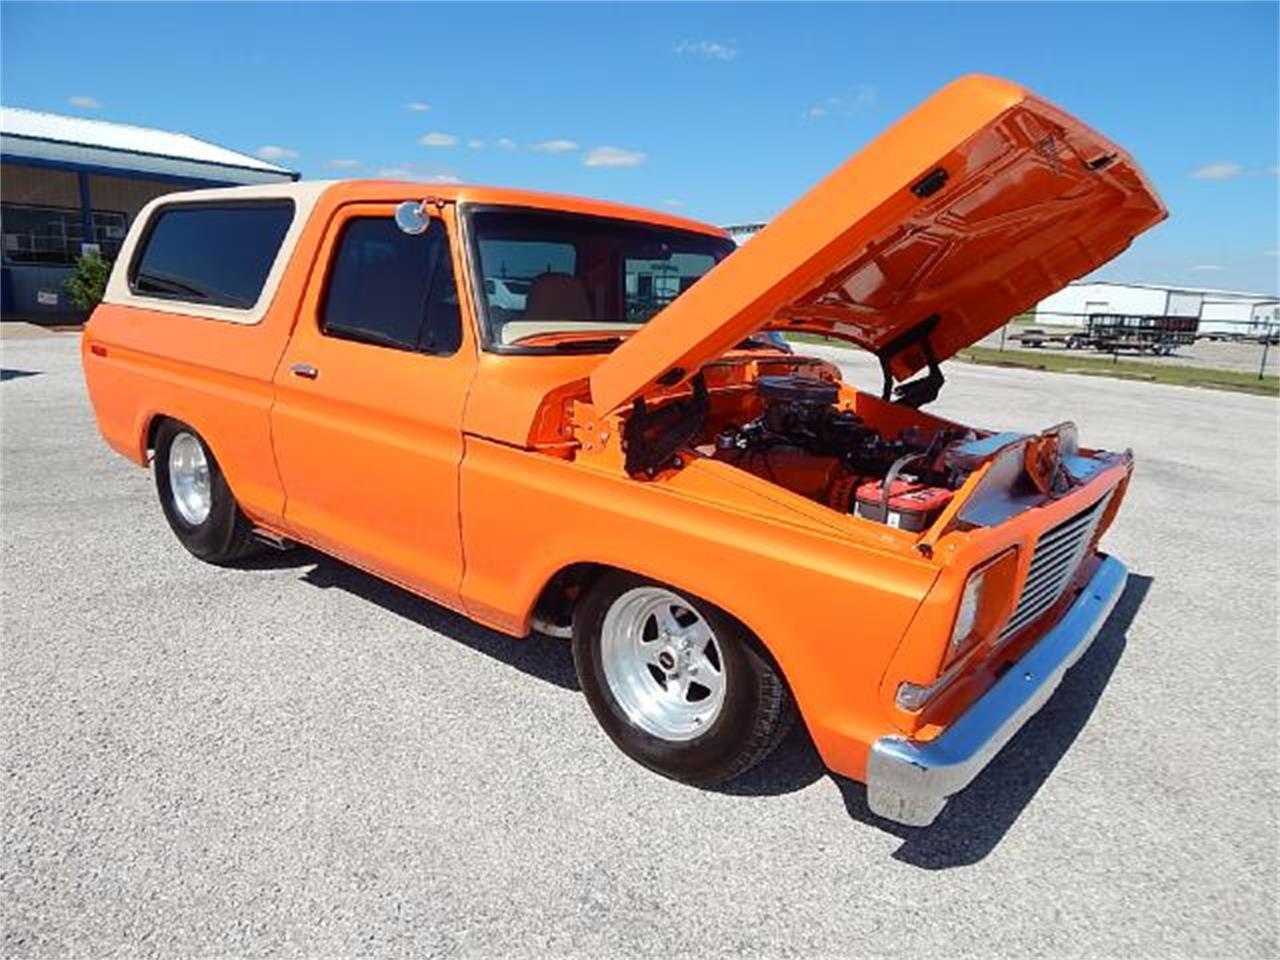 Large Picture of '79 Ford Bronco located in Wichita Falls Texas - $39,900.00 - L8LI